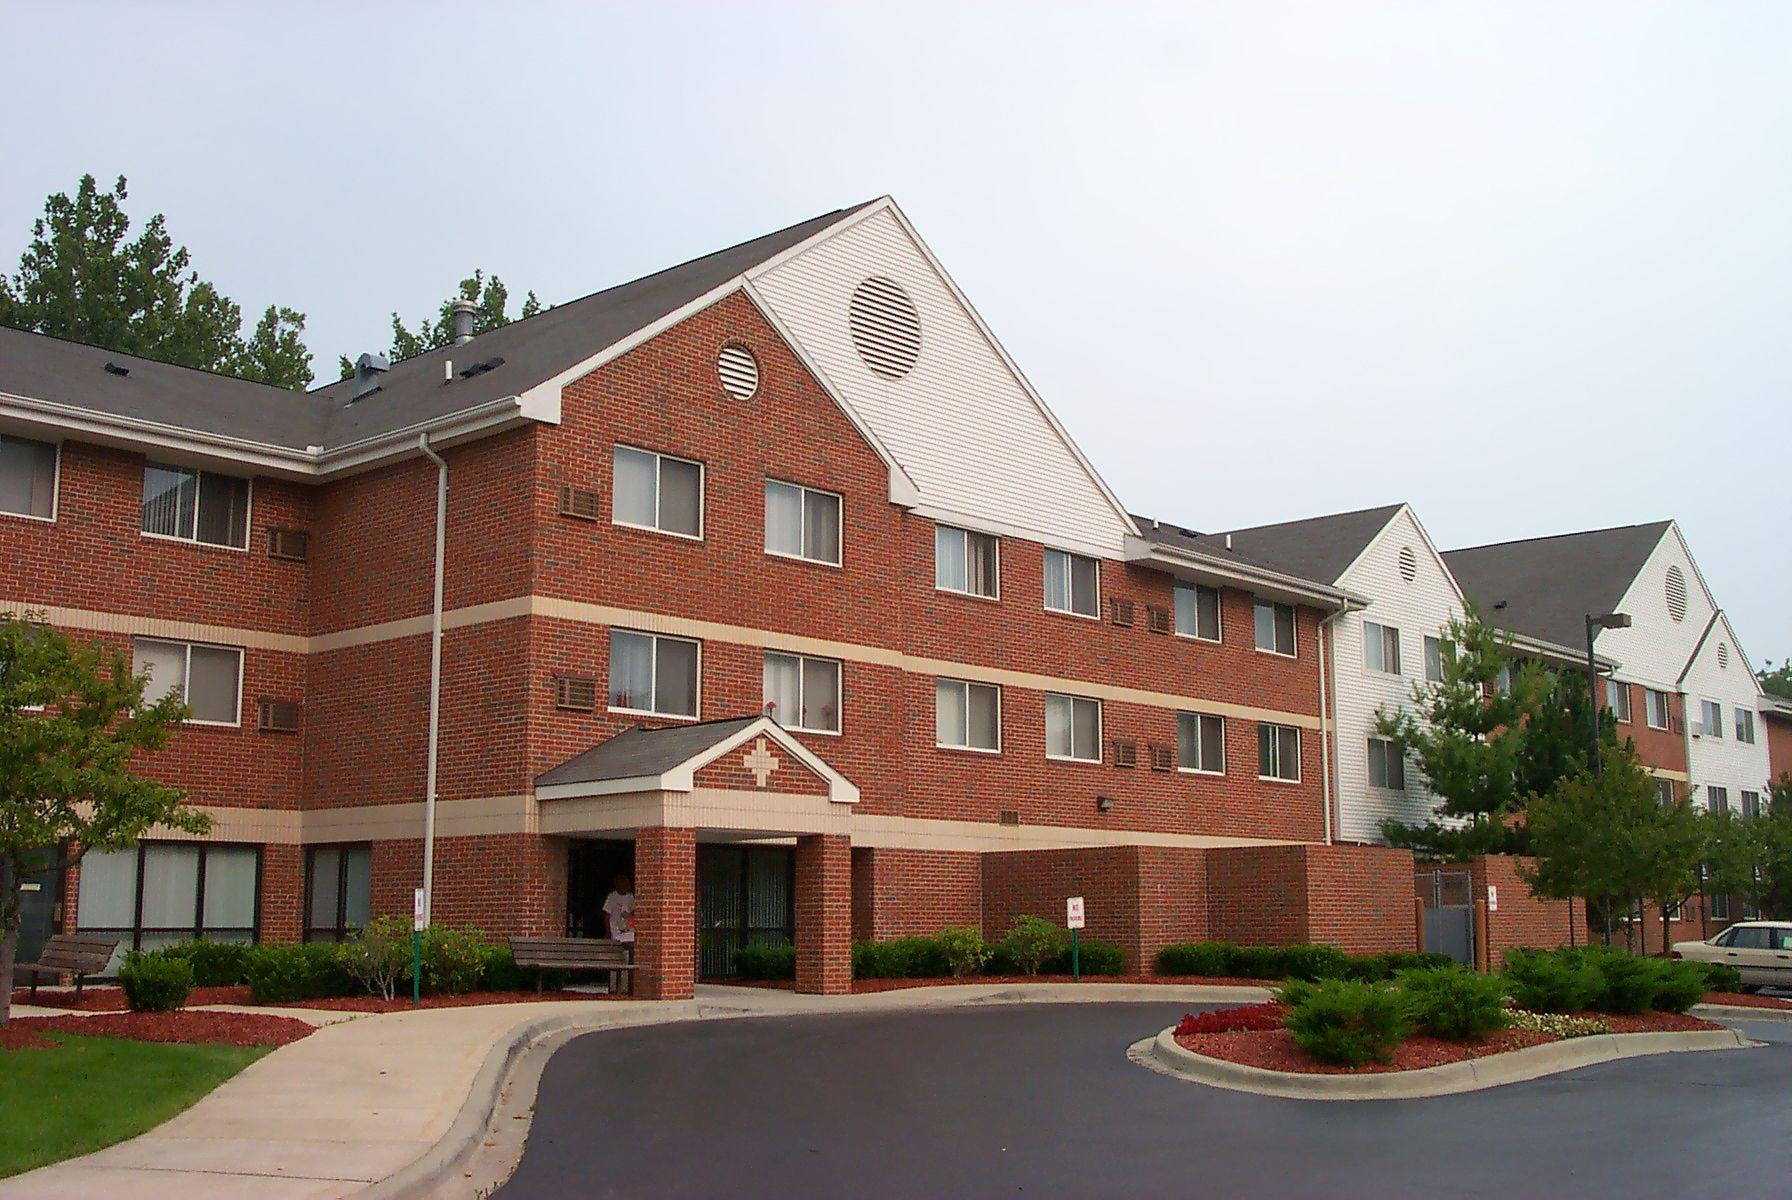 Evangelical Manor Senior Community